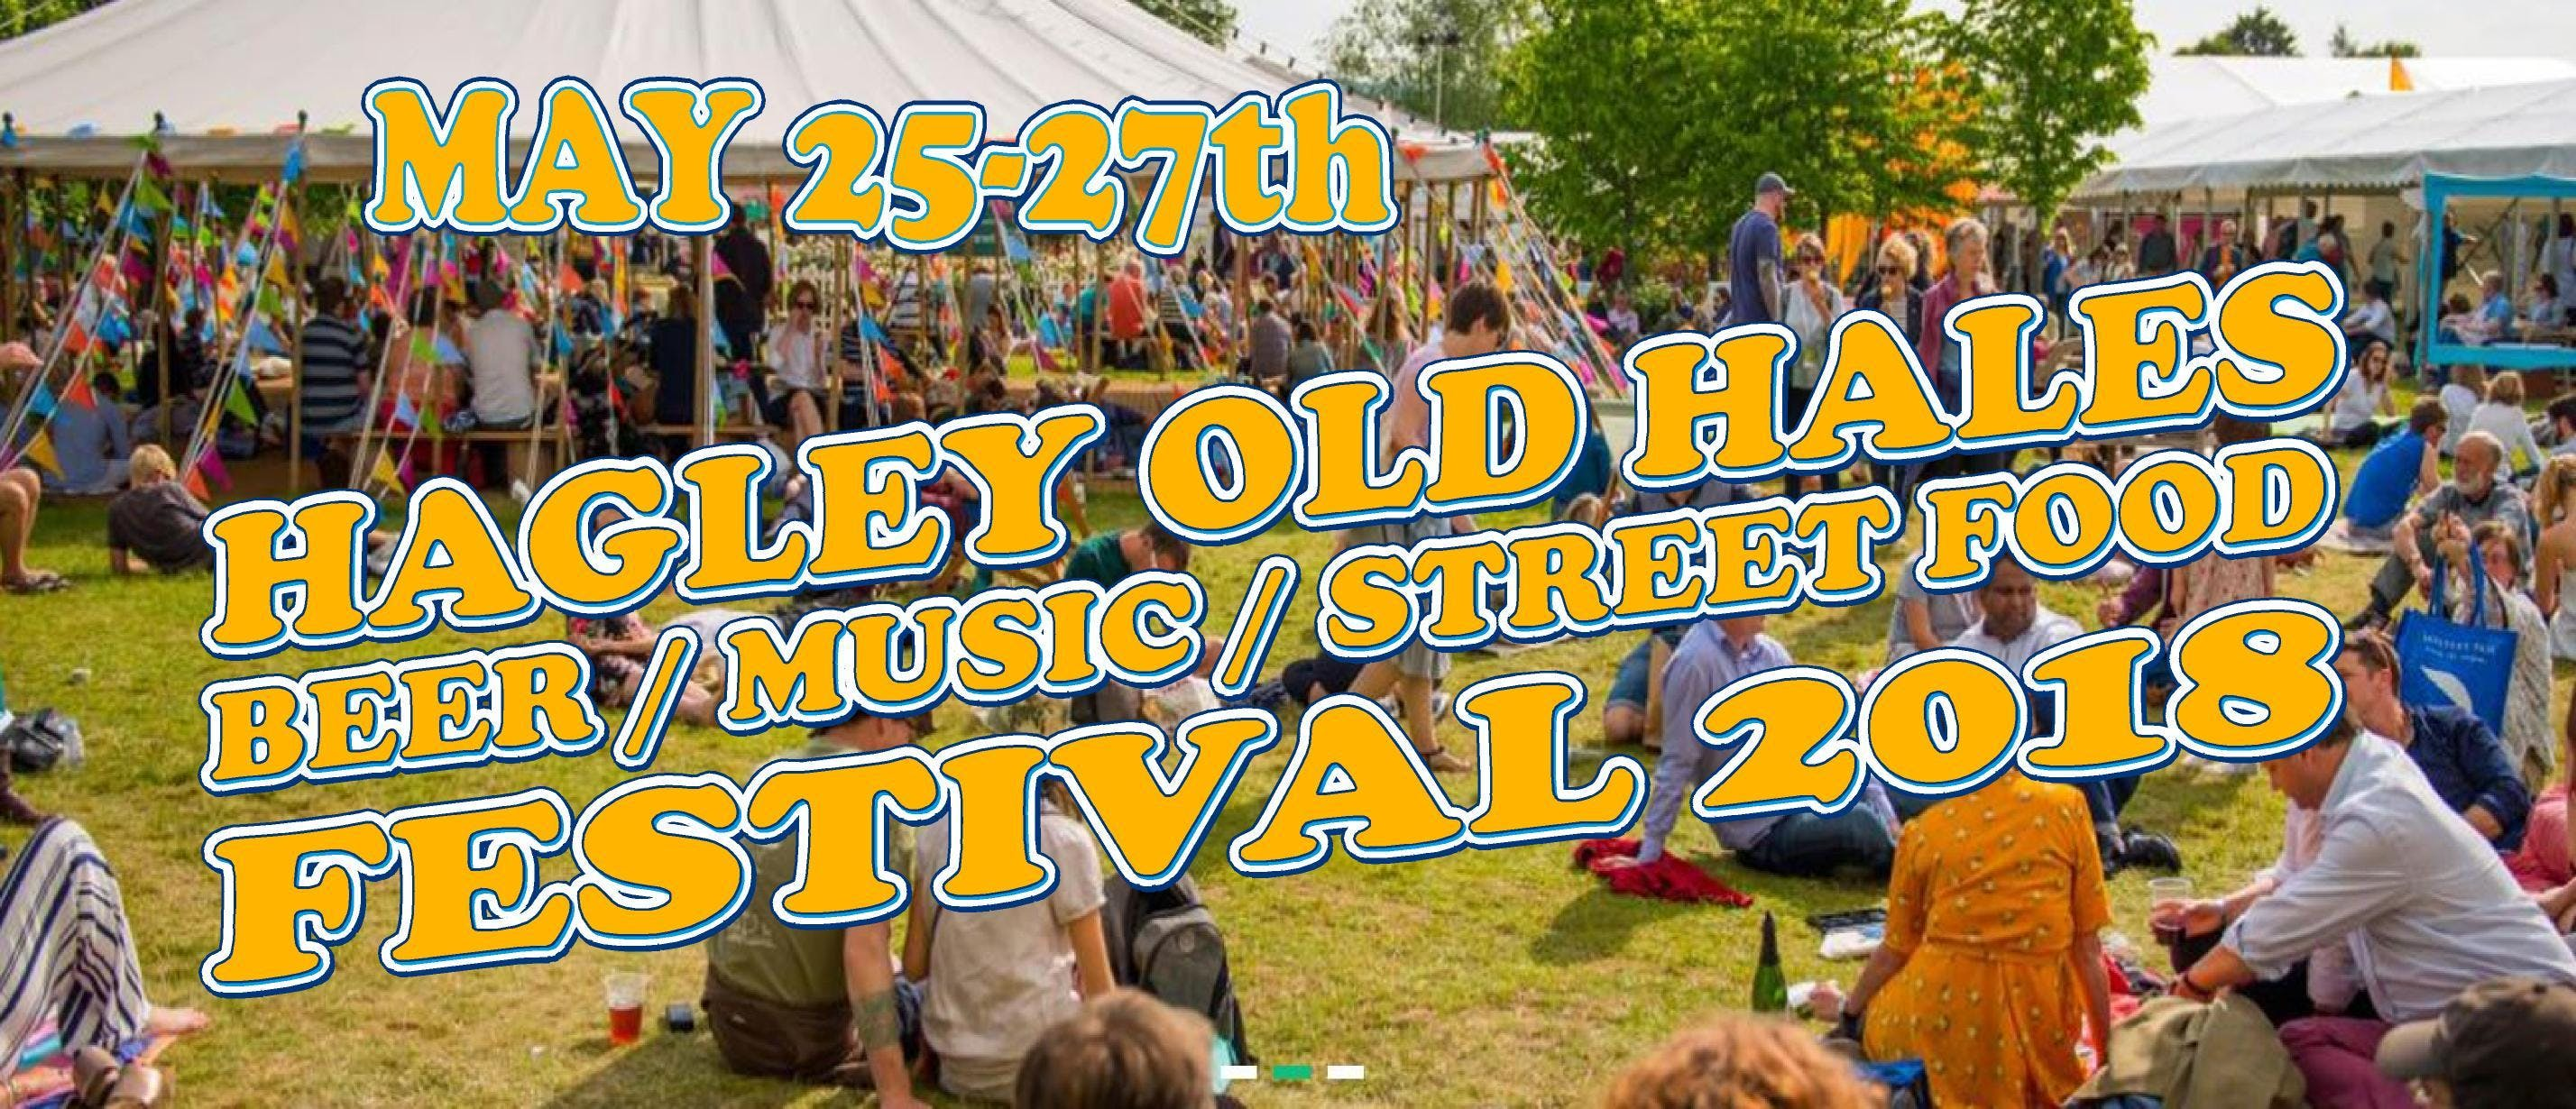 Hagley Old Hales Festival  May 25-27th 2018